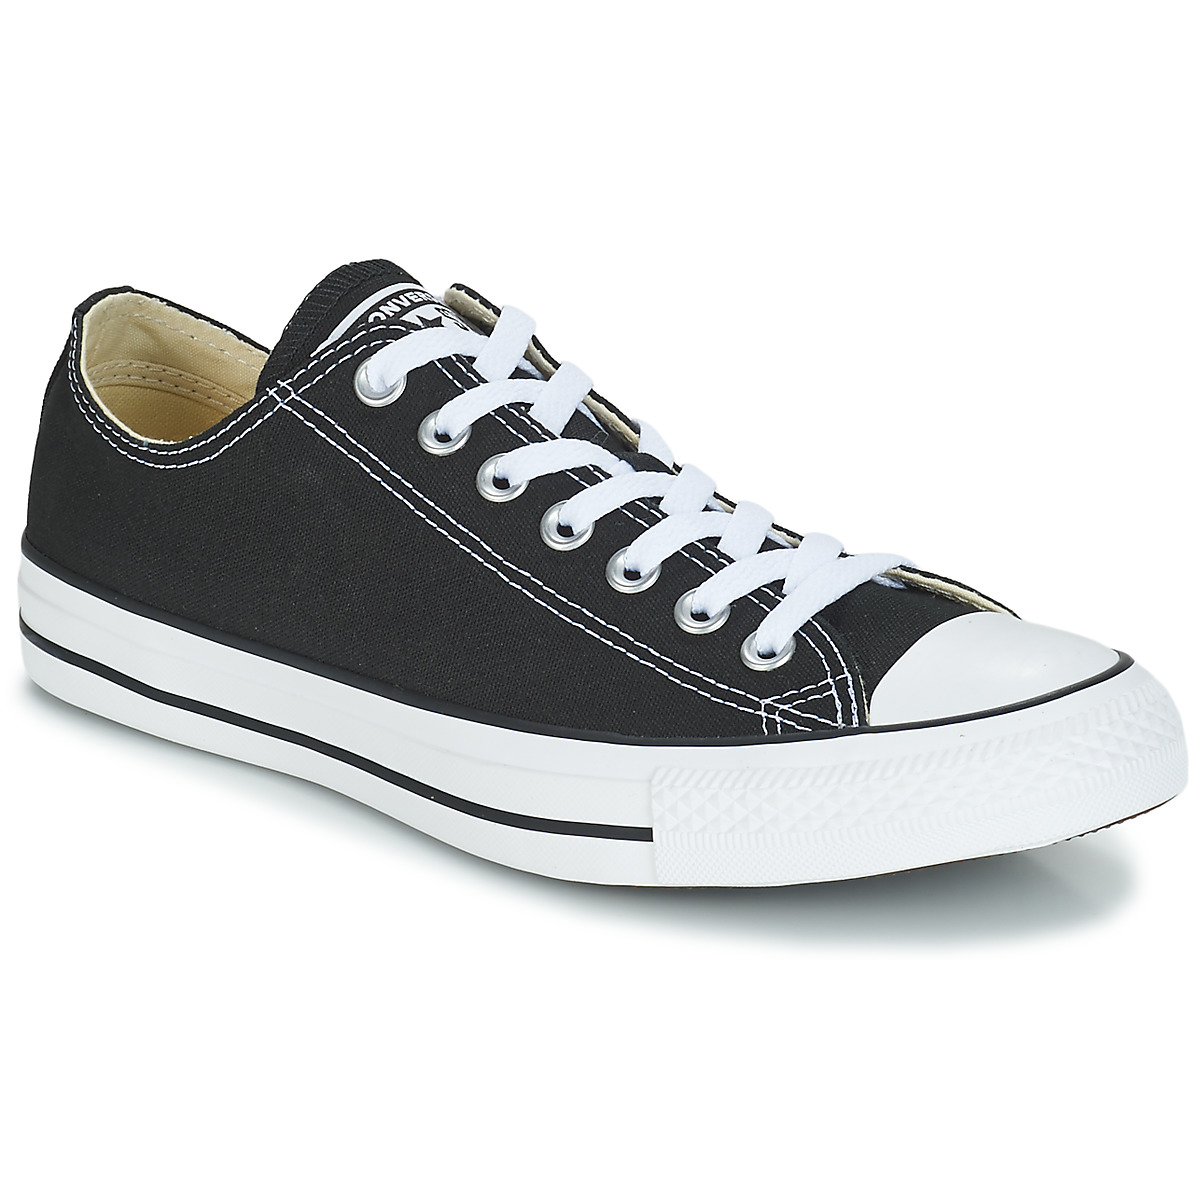 Converse CHUCK TAYLOR ALL STAR CORE OX Black